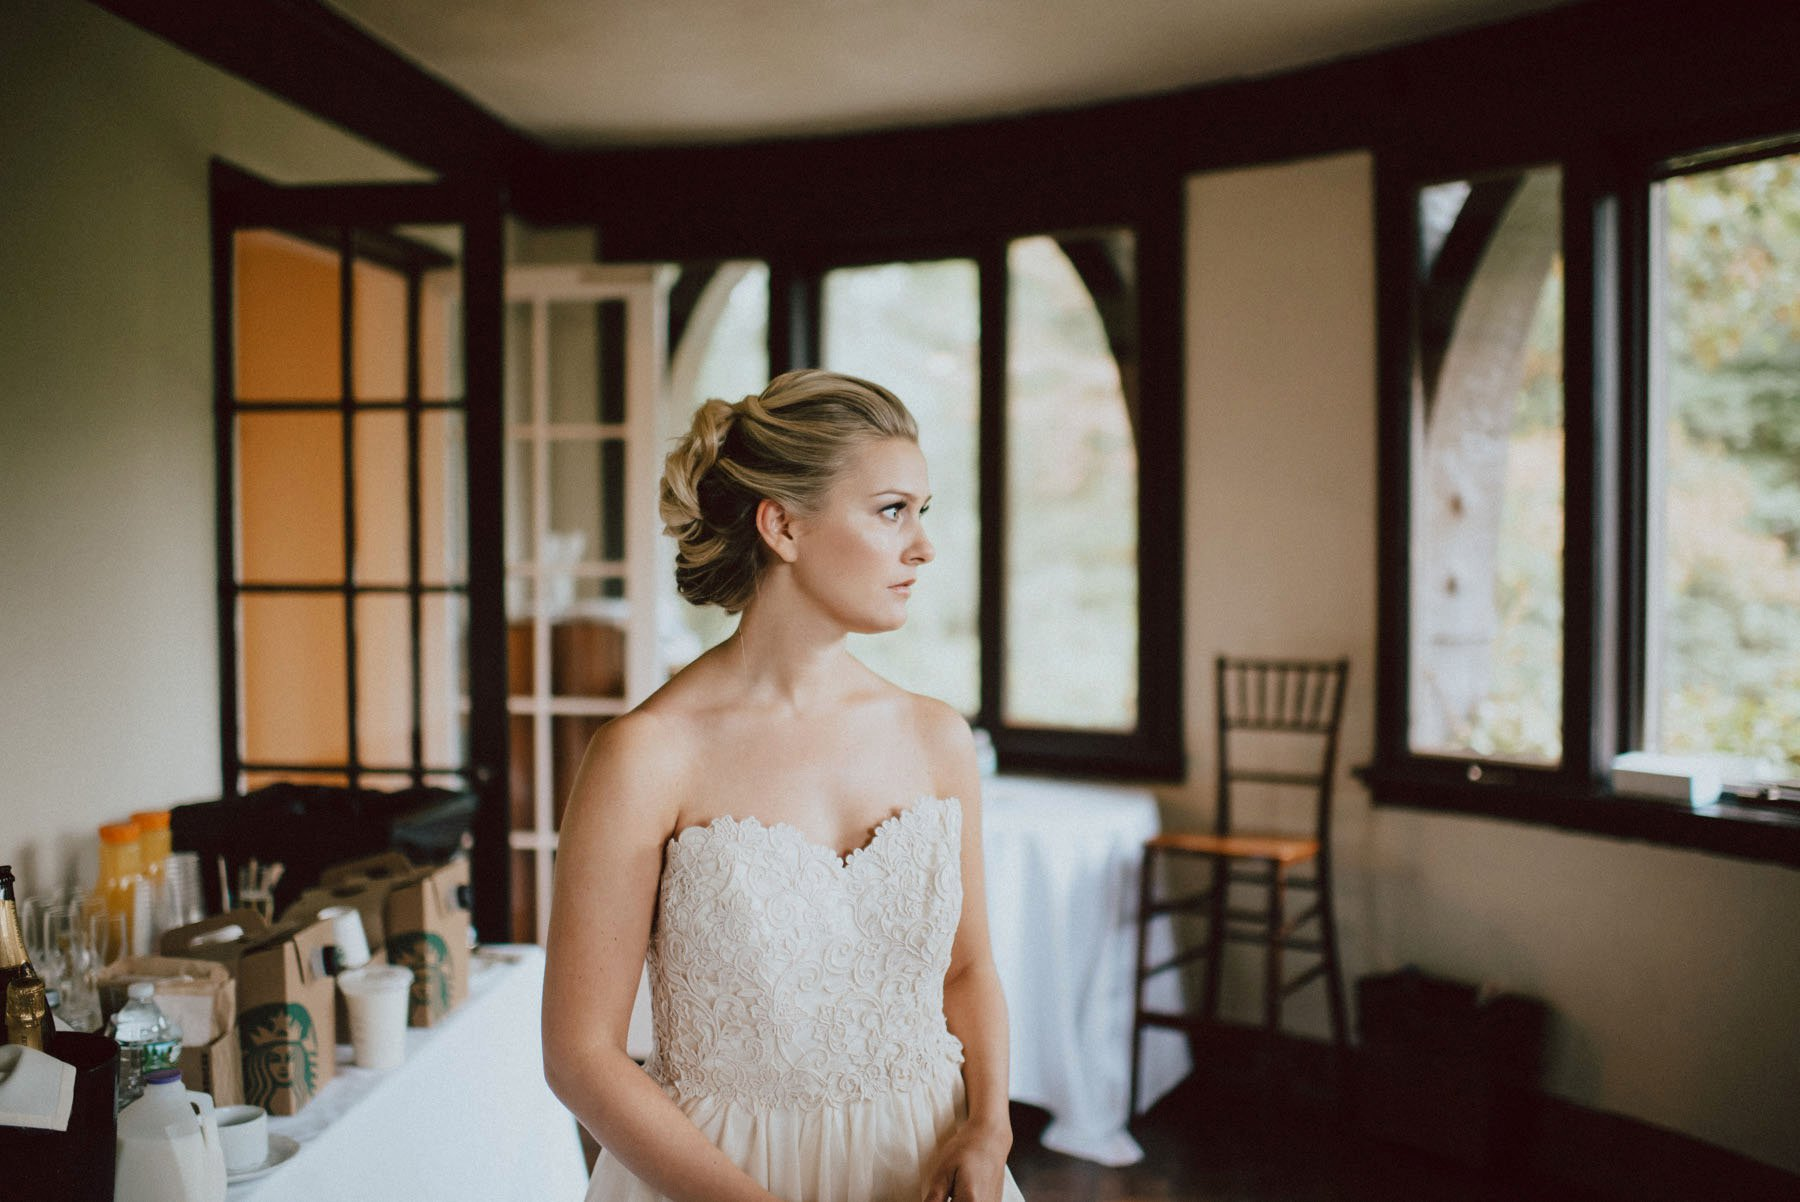 greenville-country-club-wedding-14.jpg